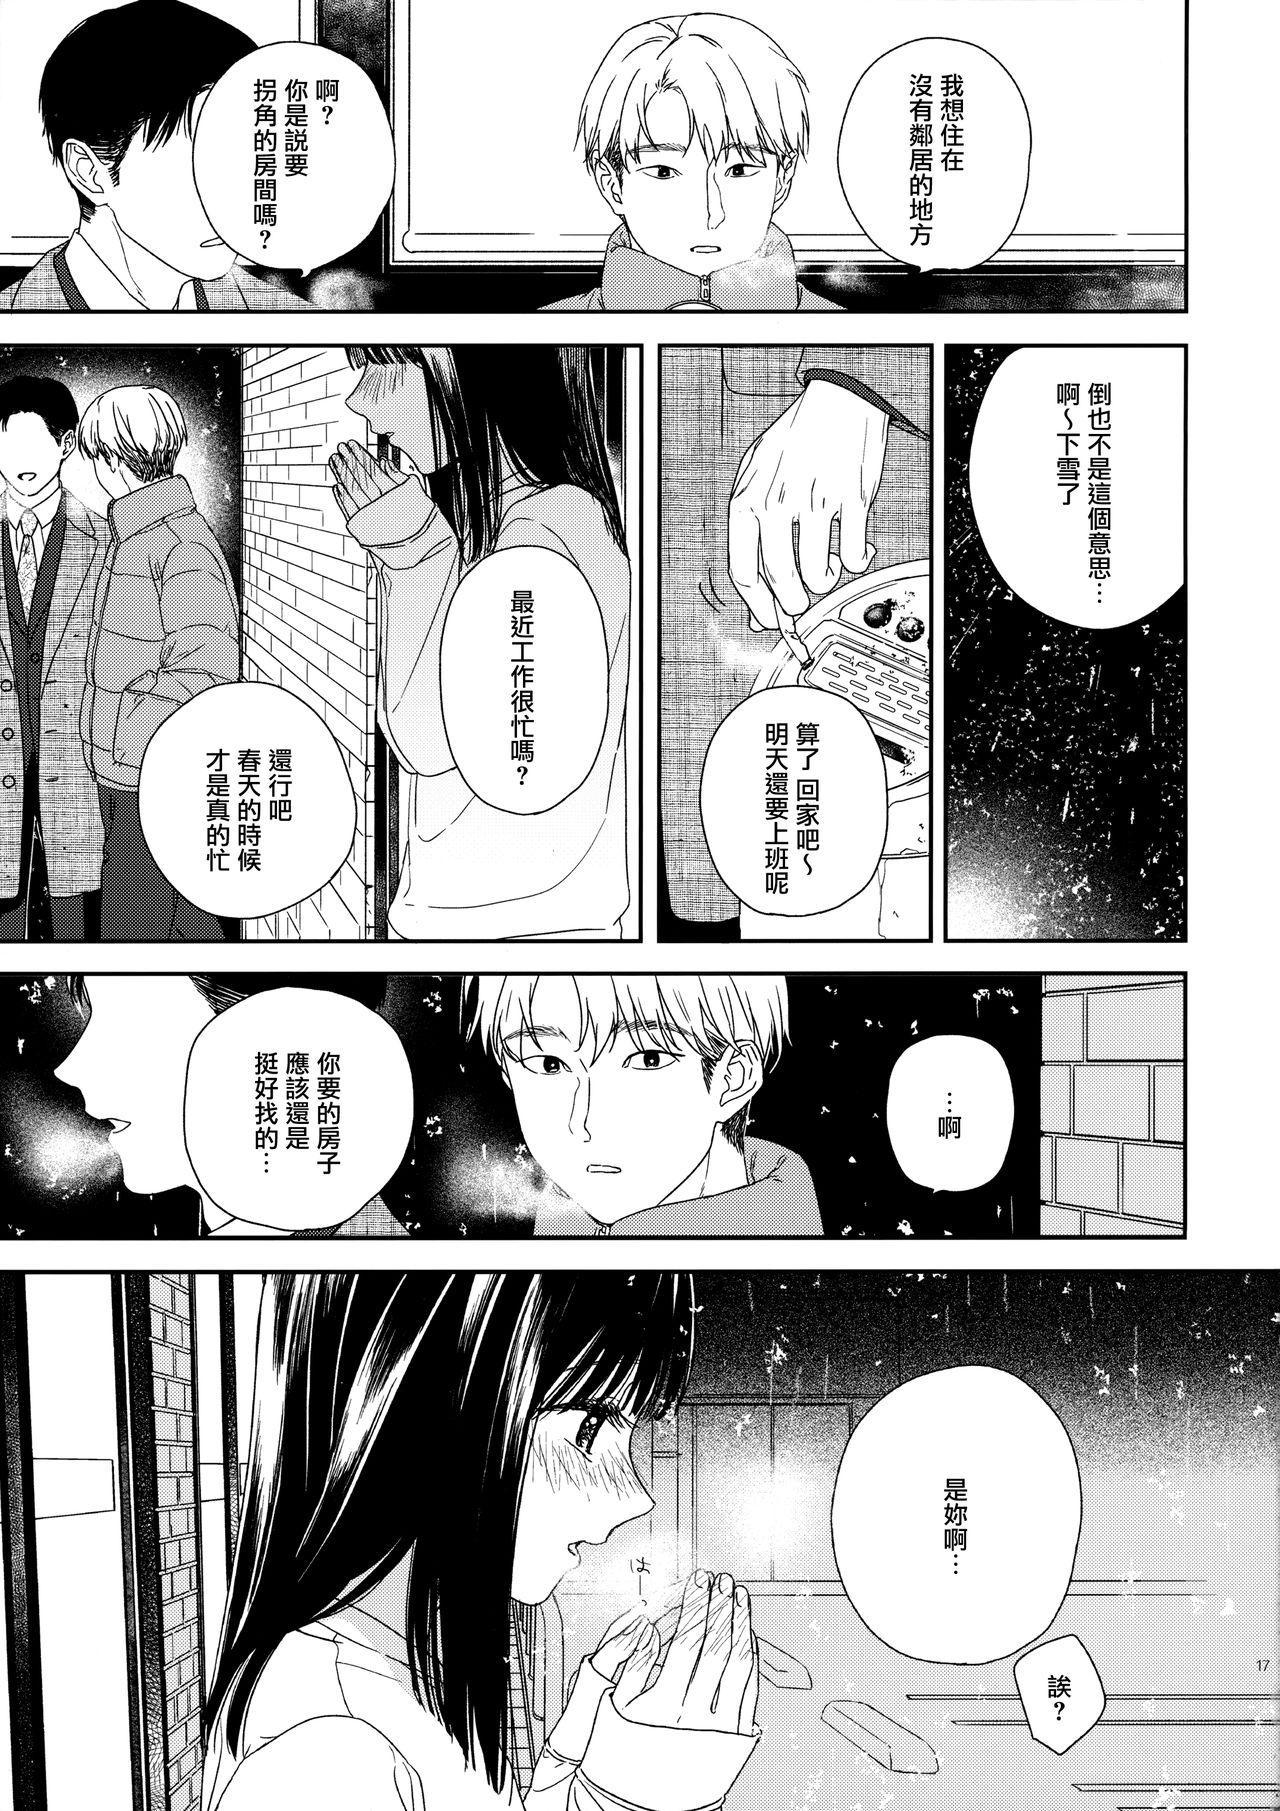 Otonari-san 16